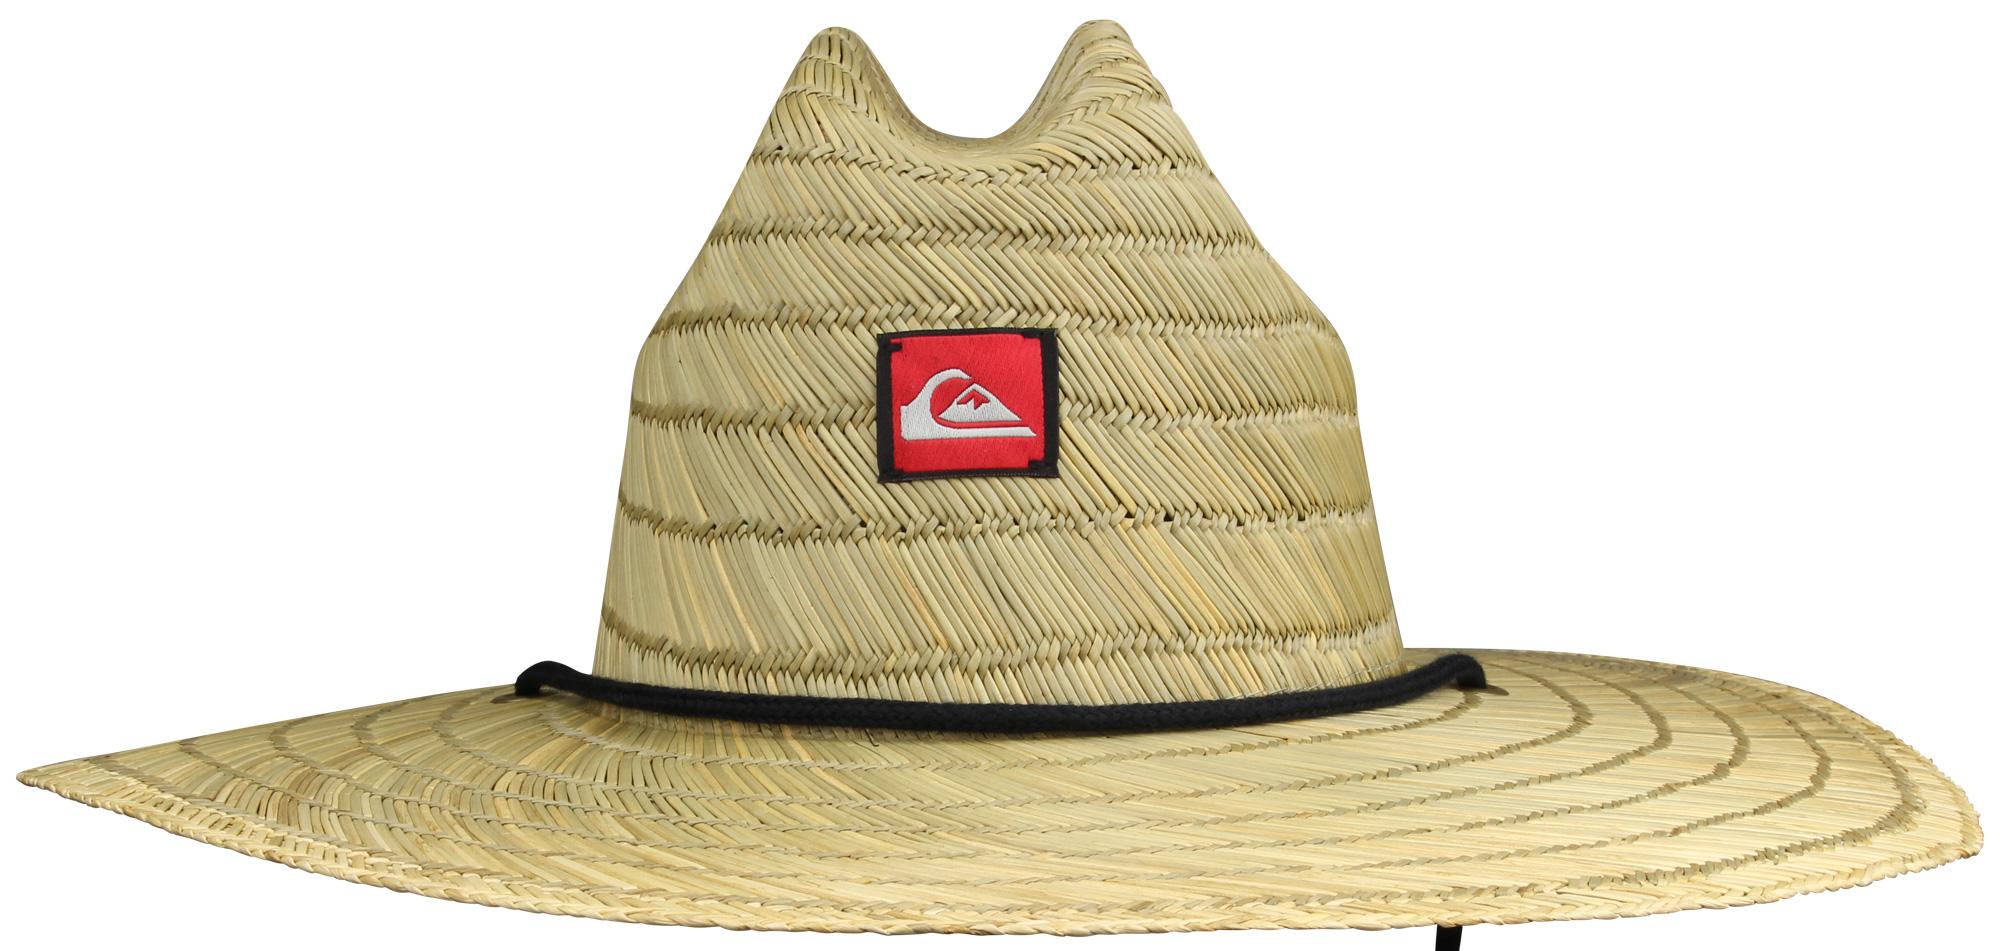 Quiksilver Mens Pierside Wide Brim Hat - Straw Brown  ae4806e764f